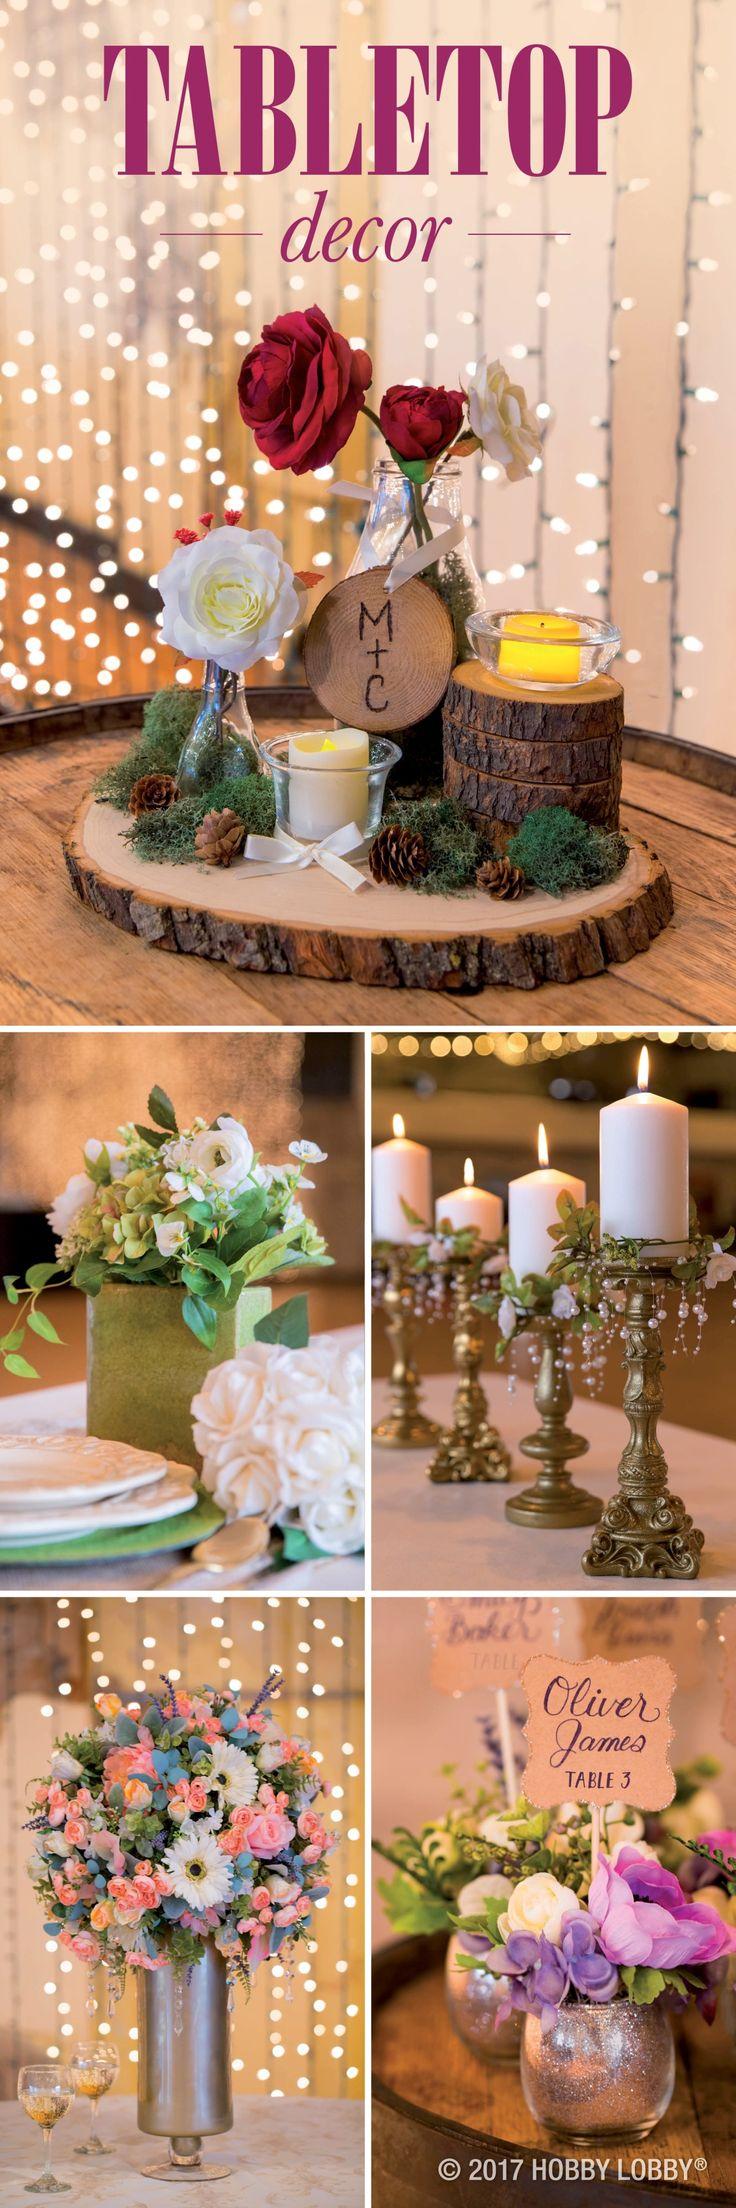 Wedding venue decorations ideas november 2018  best Wilsonwedding images on Pinterest  Wedding ideas